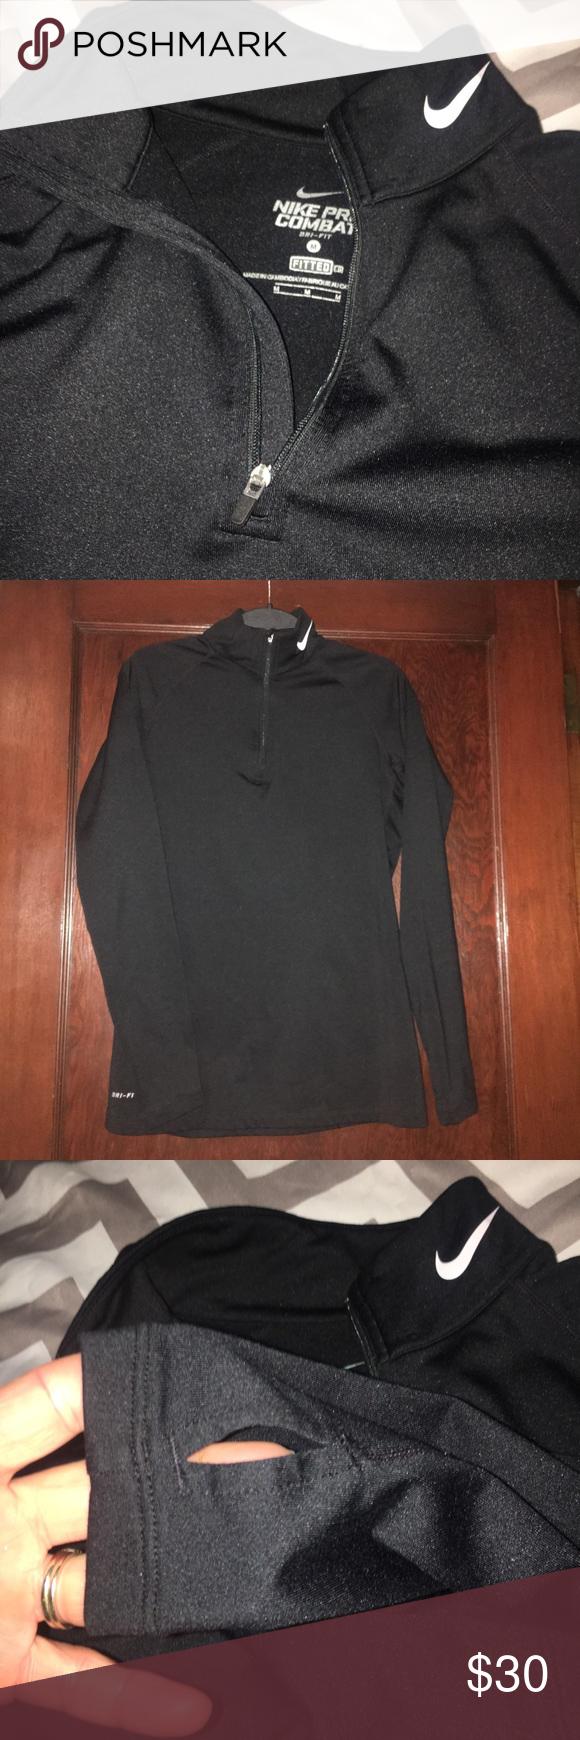 Nike Pro Combat Running Shirt Running Shirts Nike Pro Combat Black Shirt [ 1740 x 580 Pixel ]